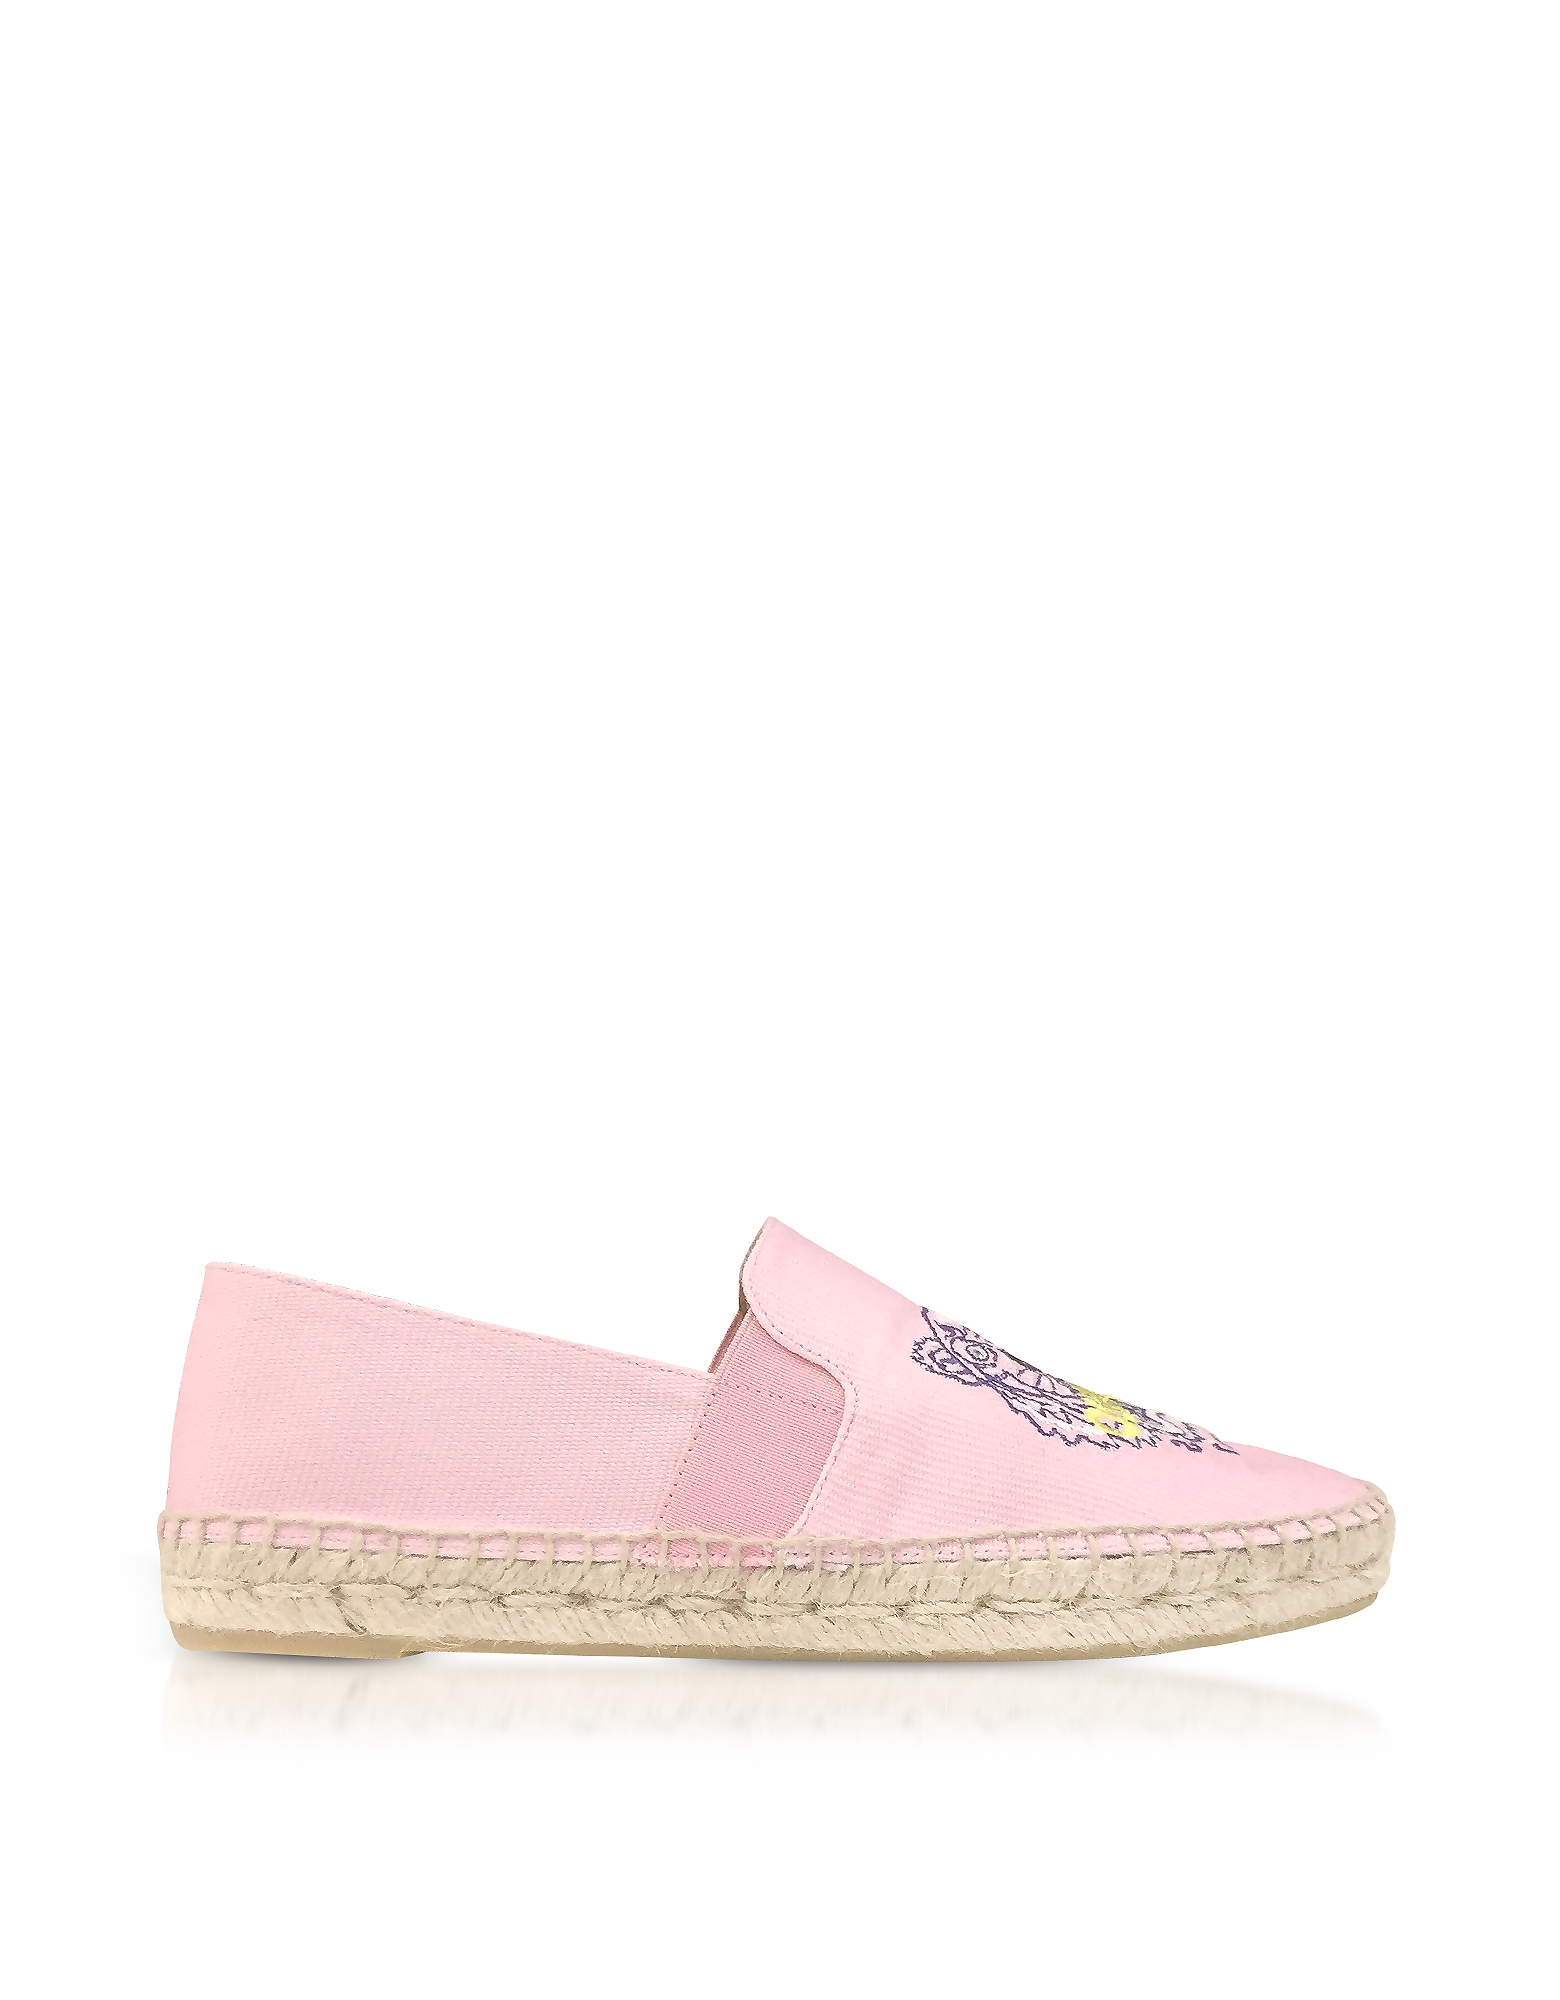 Kenzo Shoes, Flamingo Pink Canvas Women's Tiger Espadrilles